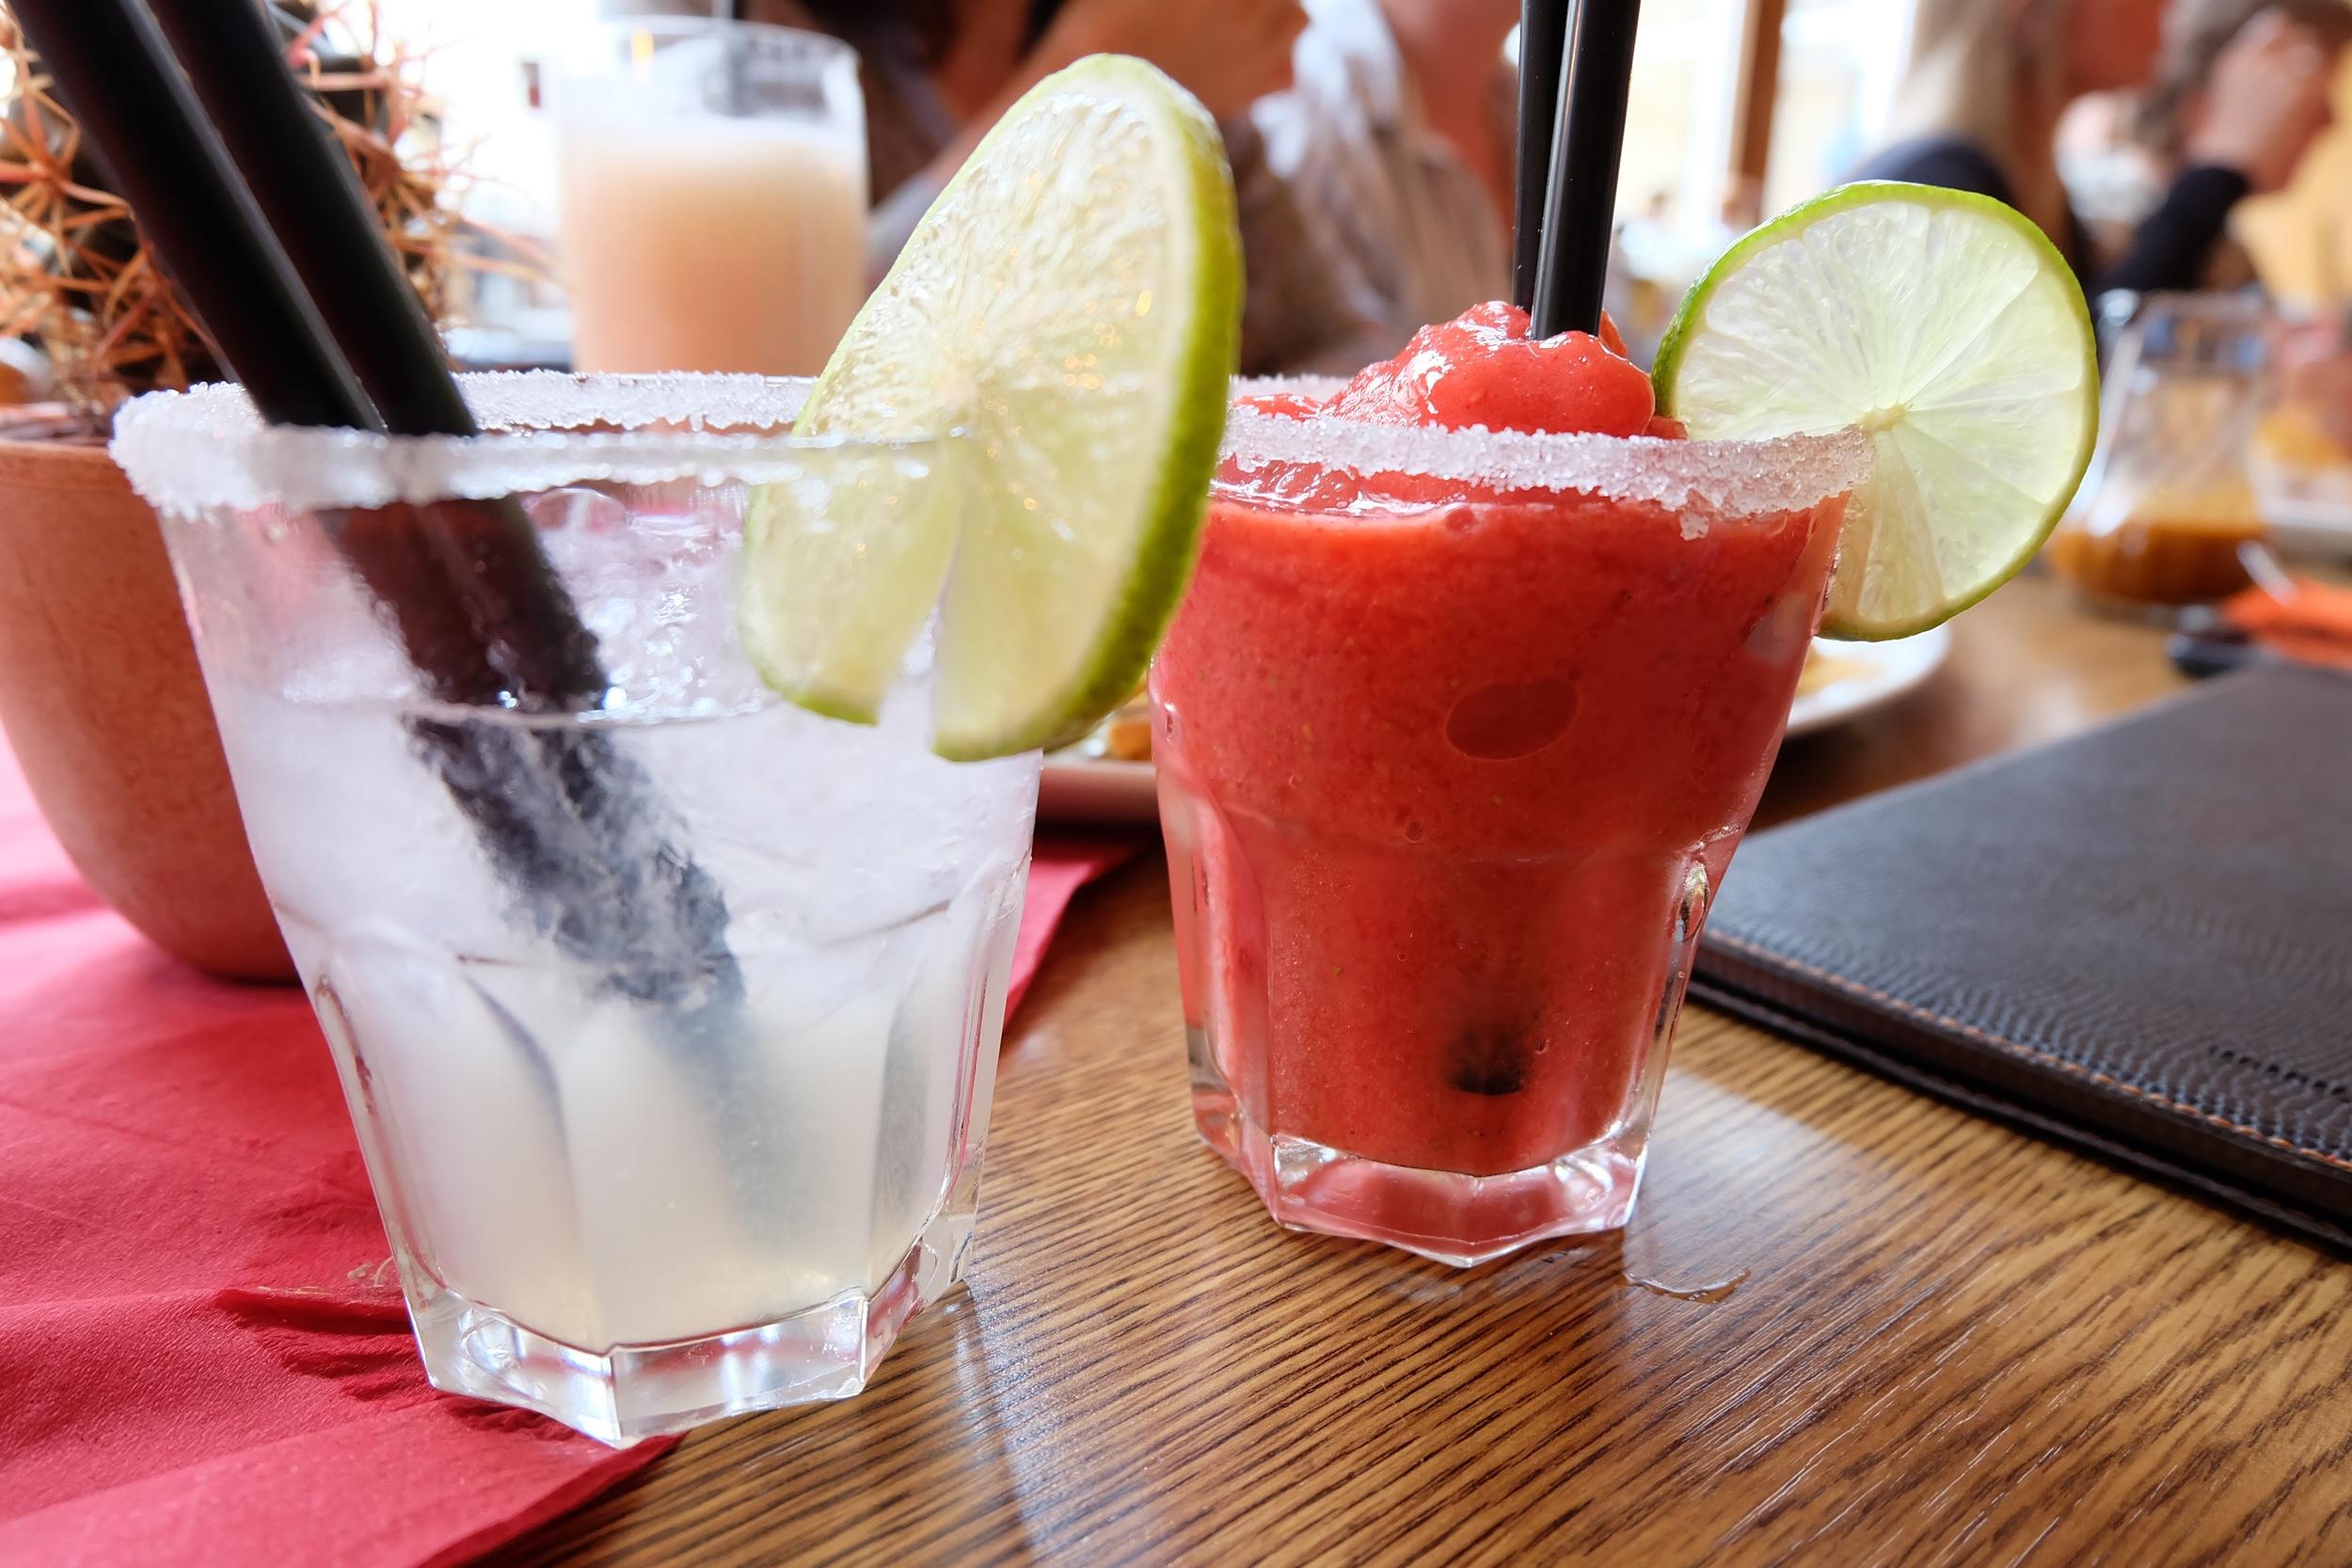 A  Margarita  and virgin frozen strawberry daiquiri